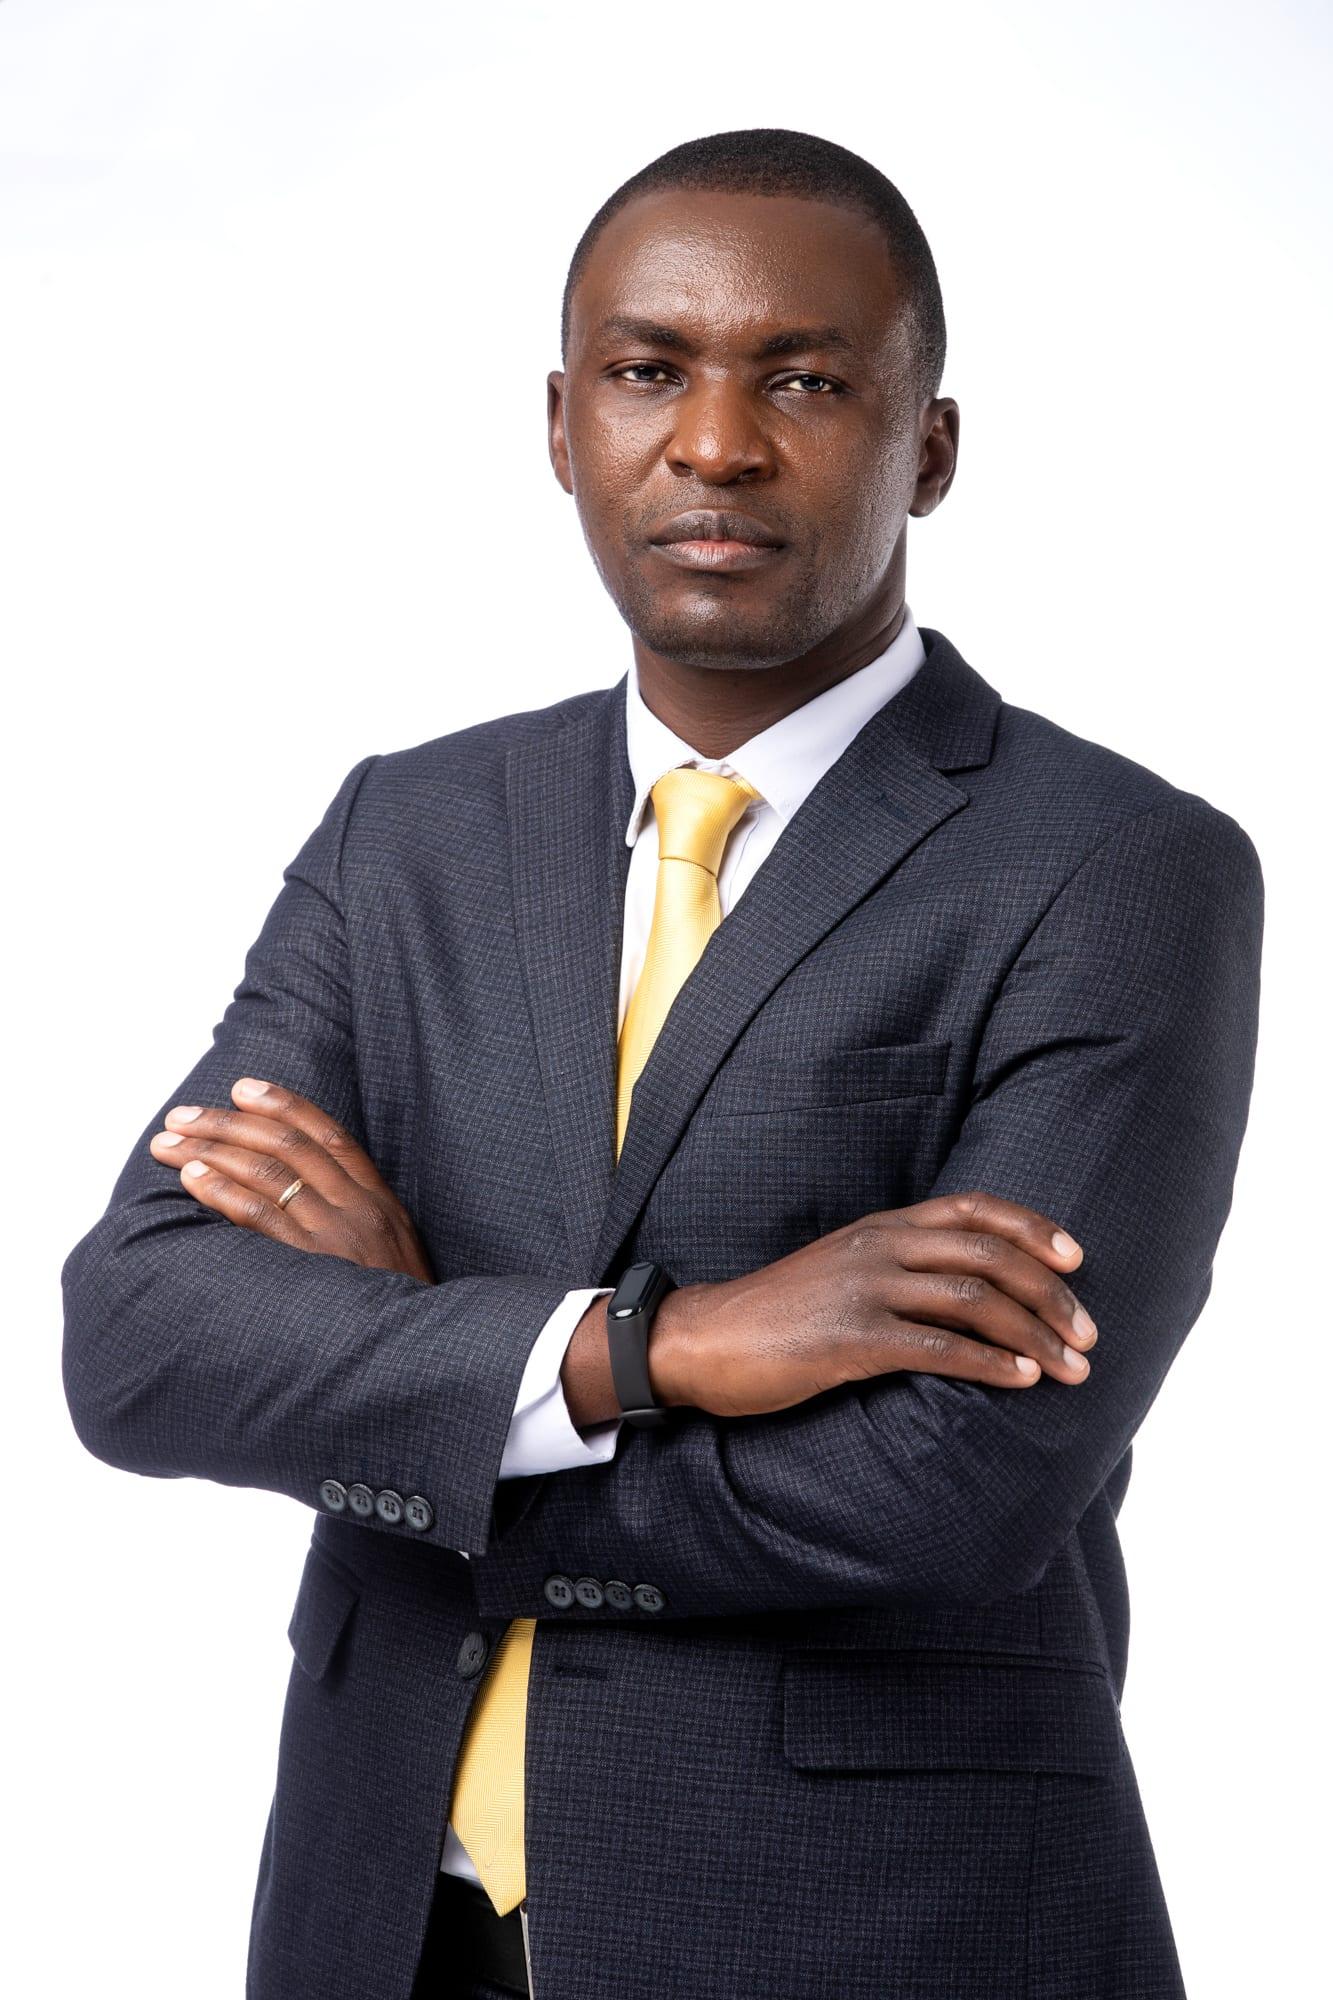 Enwealth General Manager George Oyuga Joins Zamara